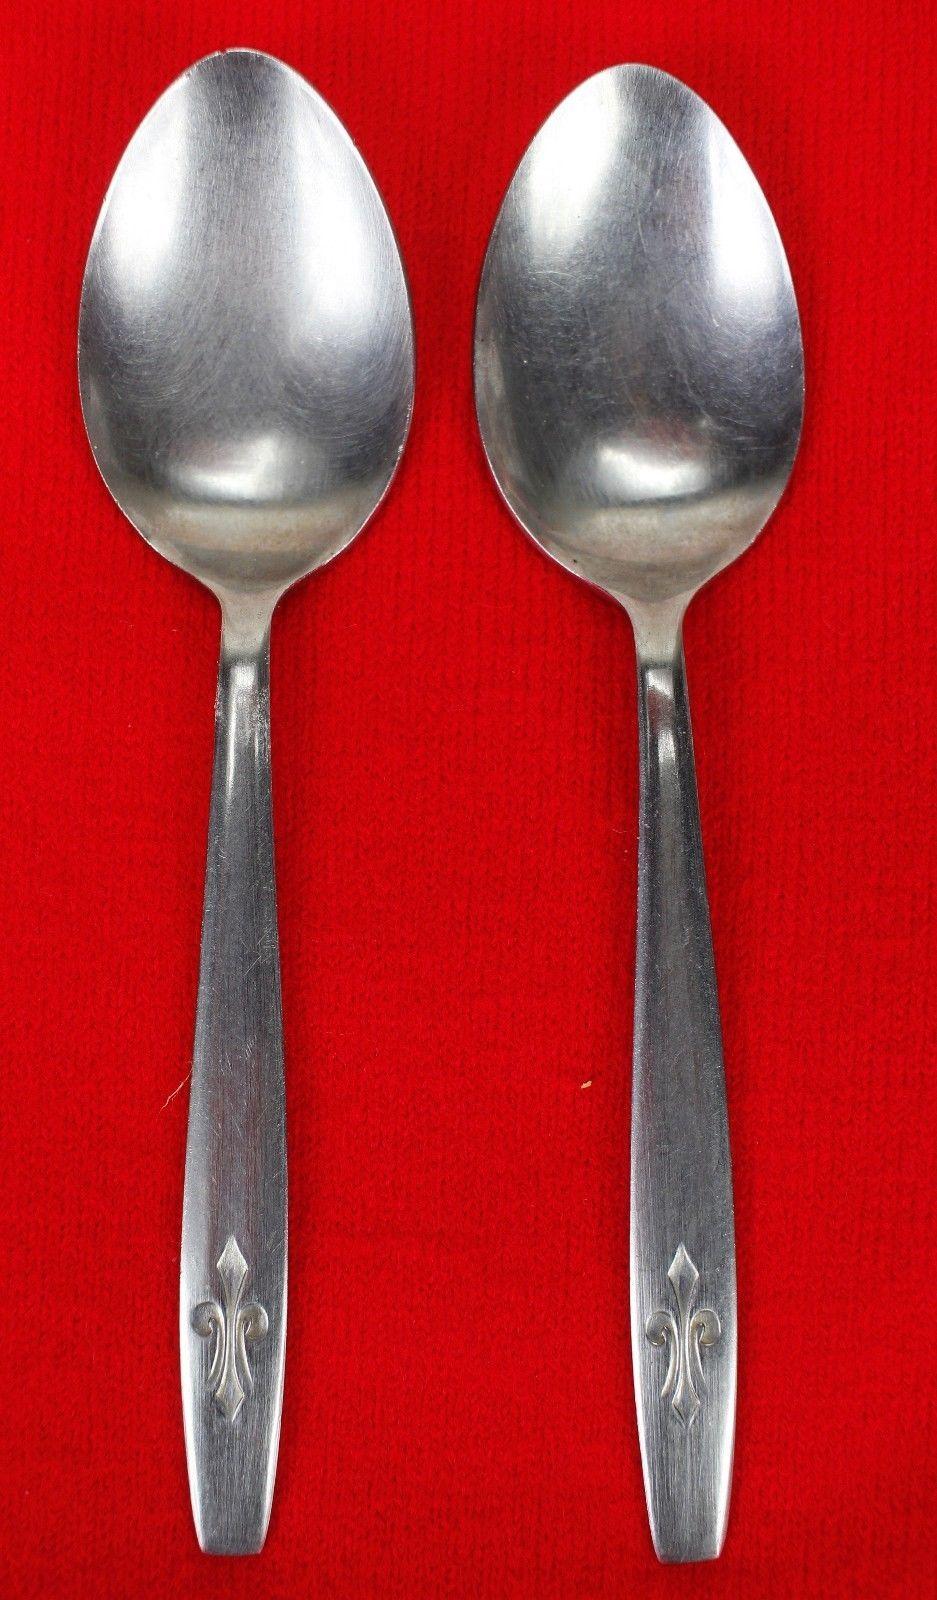 "2X Teaspoons CI Japan CIF10 Stainless Glossy Flatware 6"" Tea Spoon Fleur De Lis"